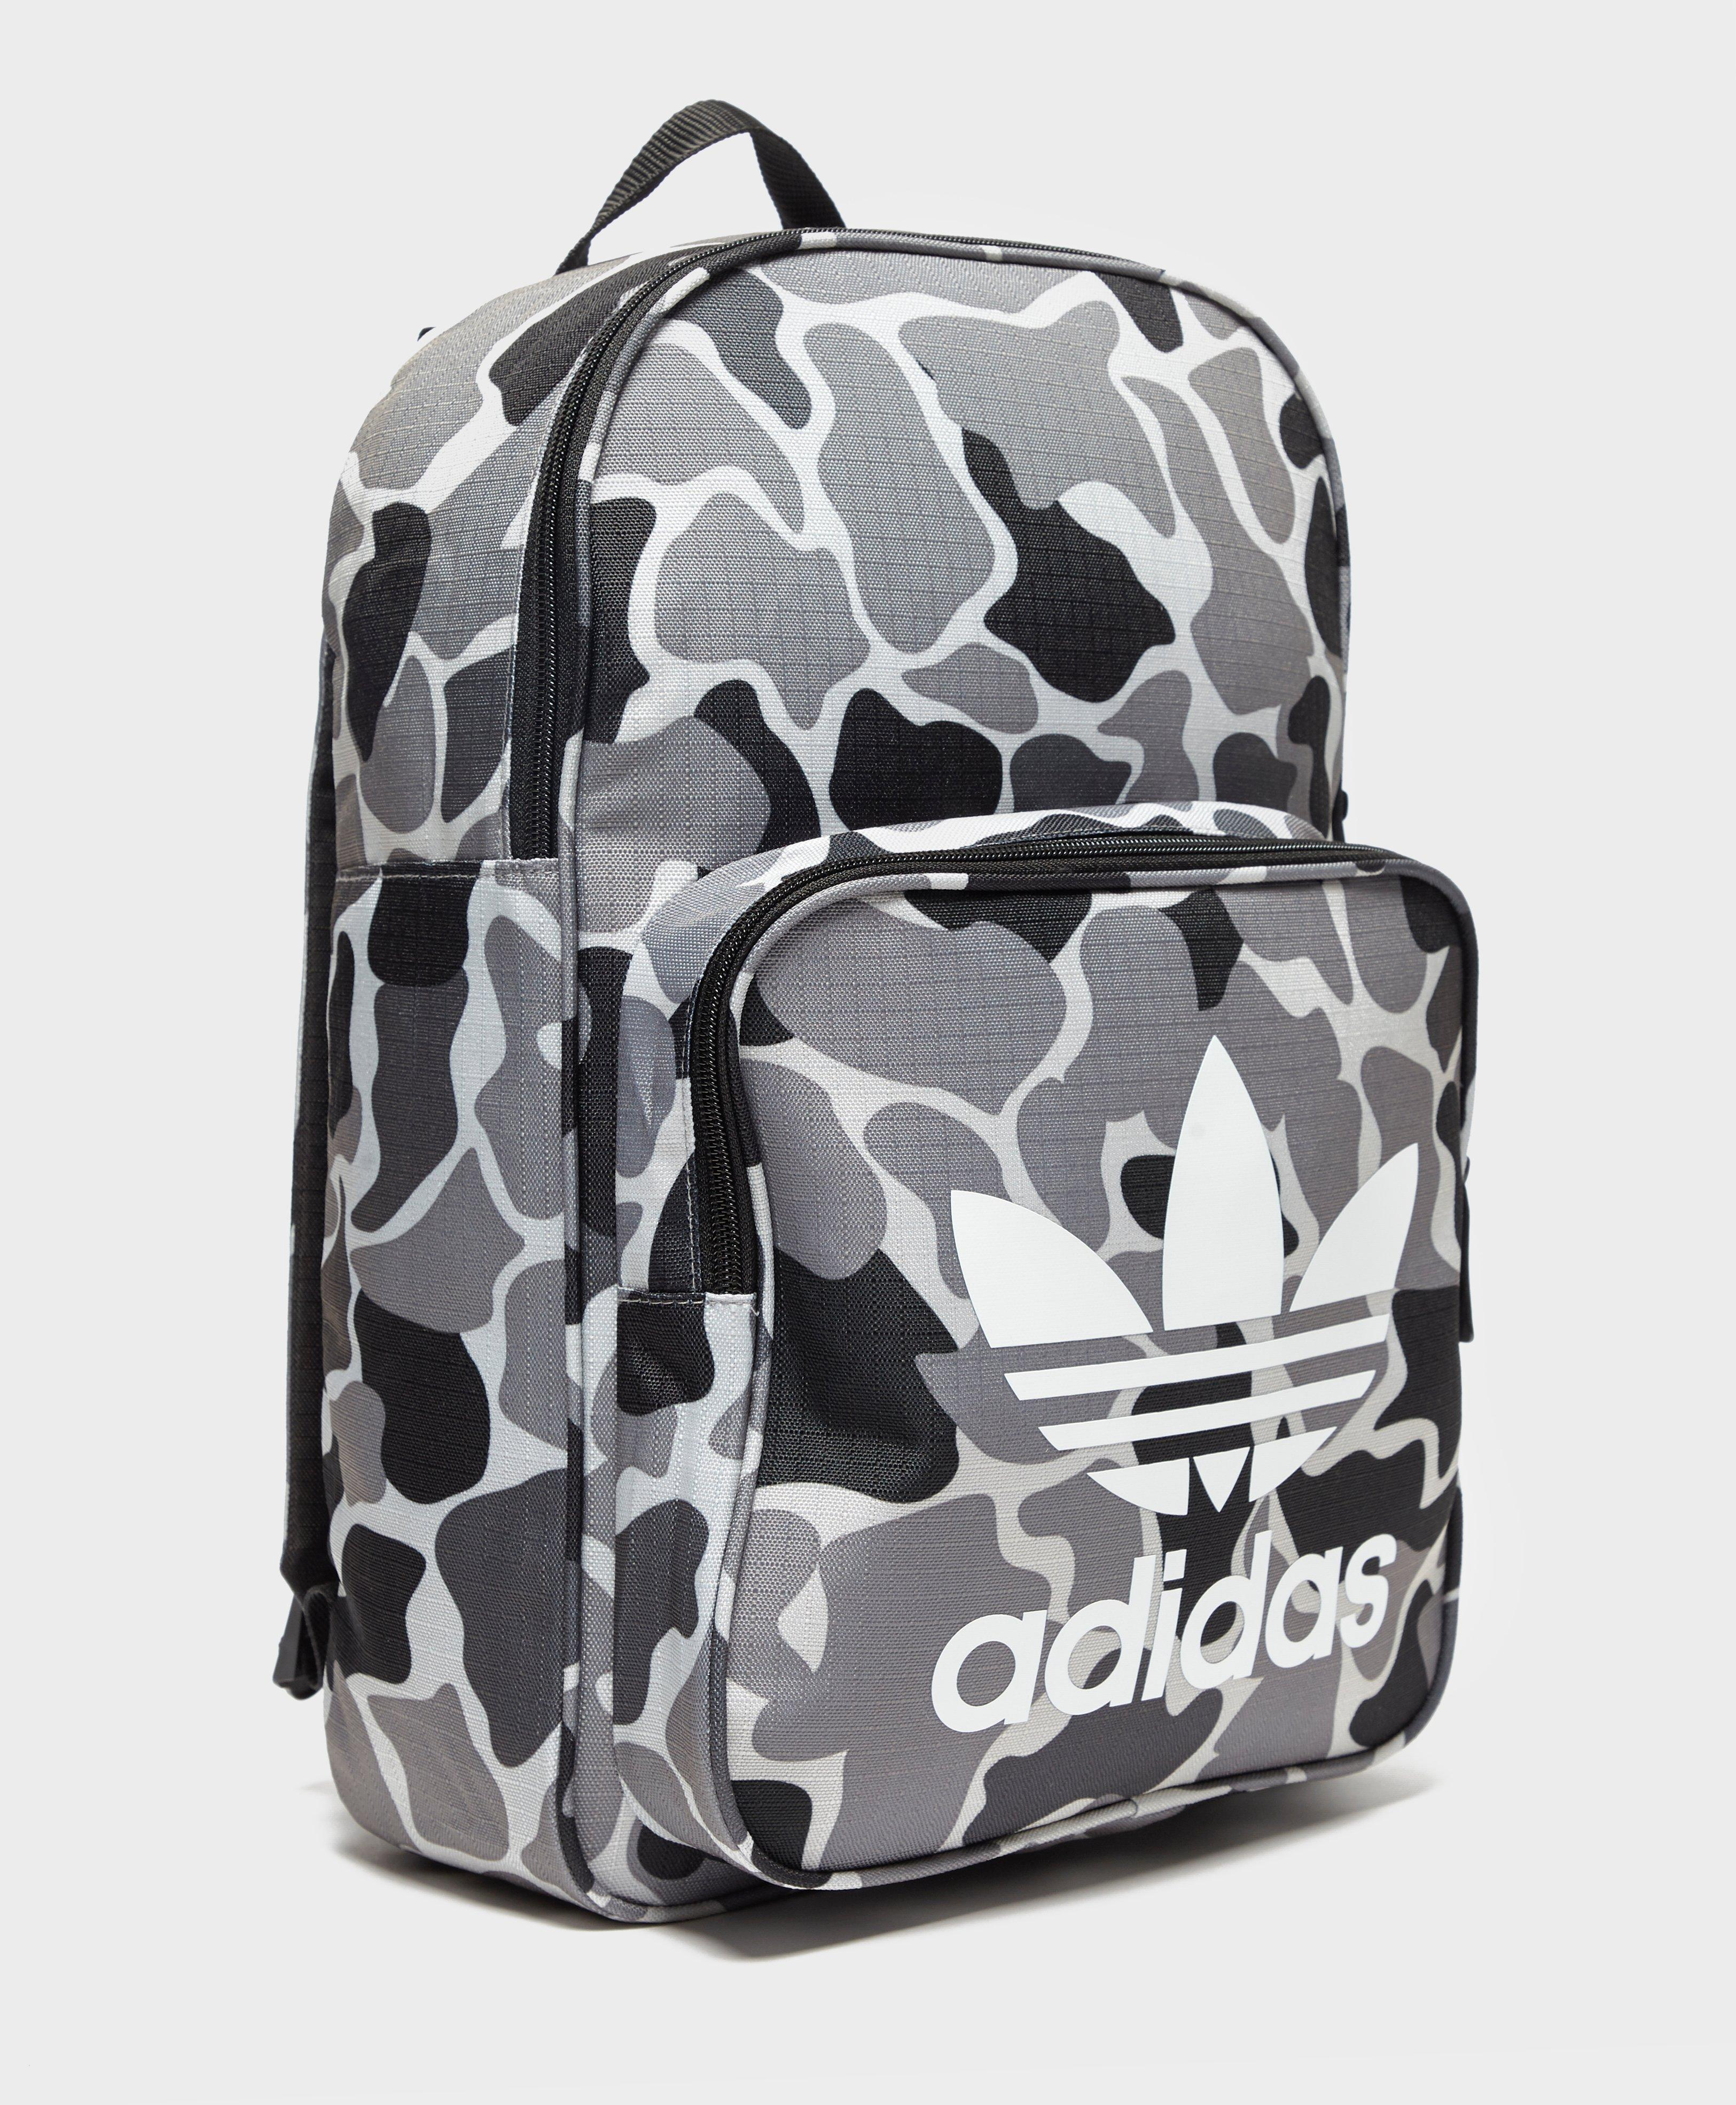 2556c3b8f1 Lyst - adidas Originals Classic Backpack for Men